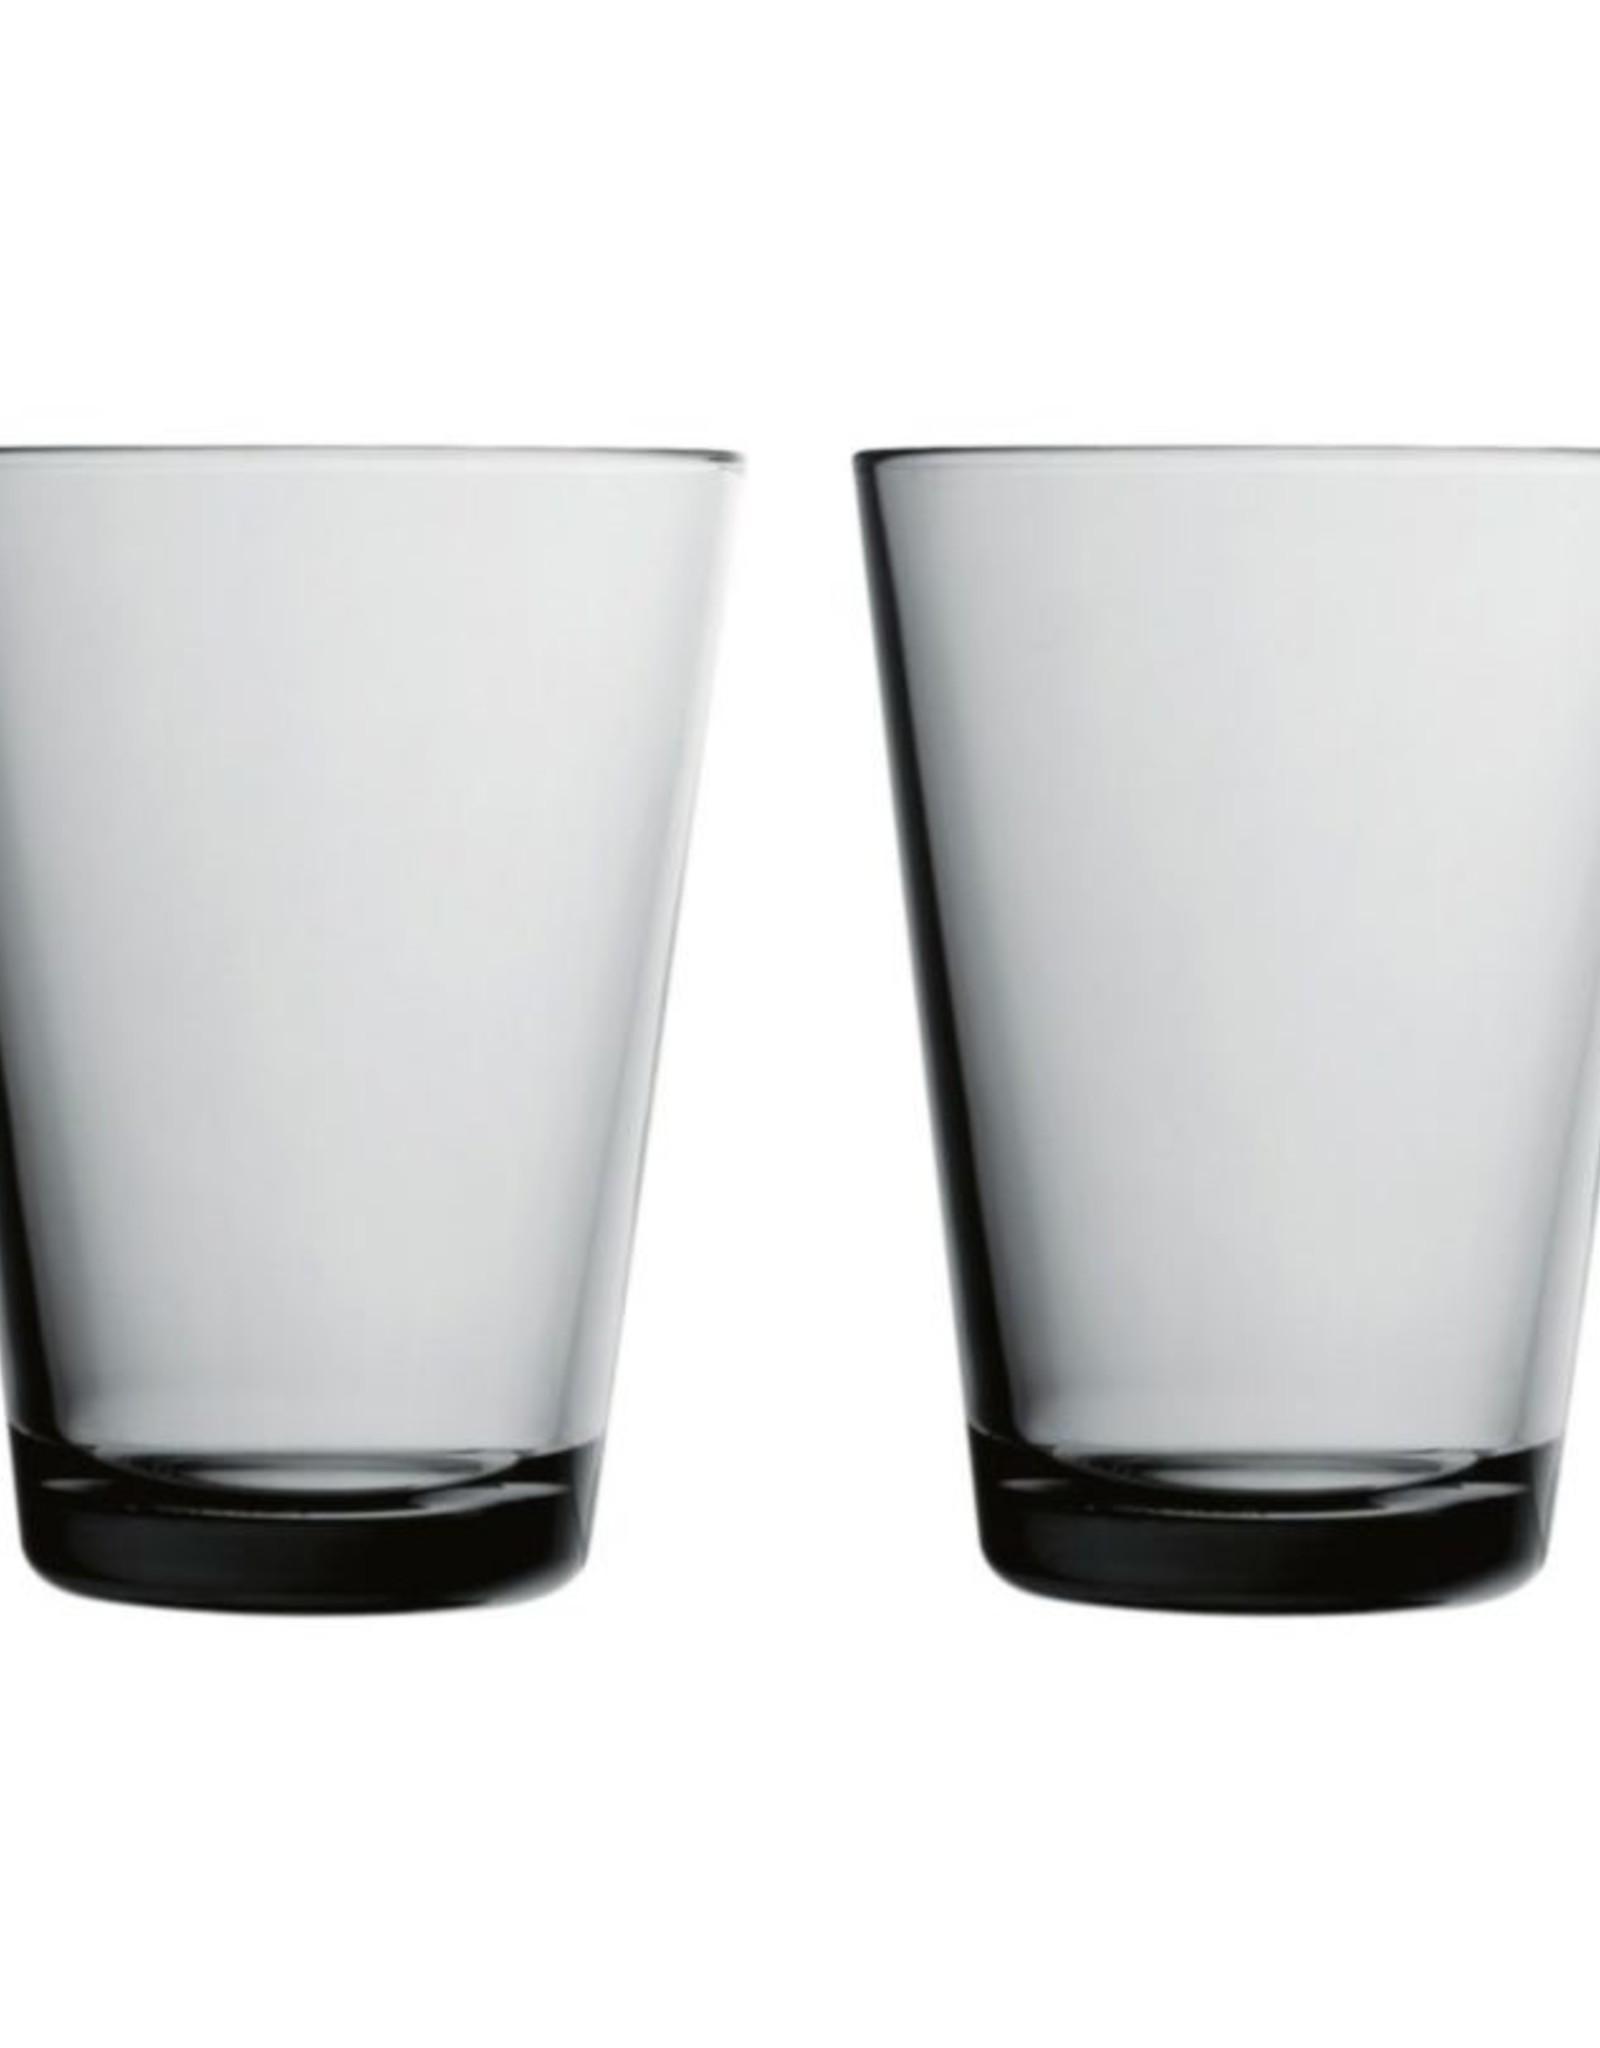 Iittala Iittala Kartio - Glas - 40 cl - Grijs - 2 stuks